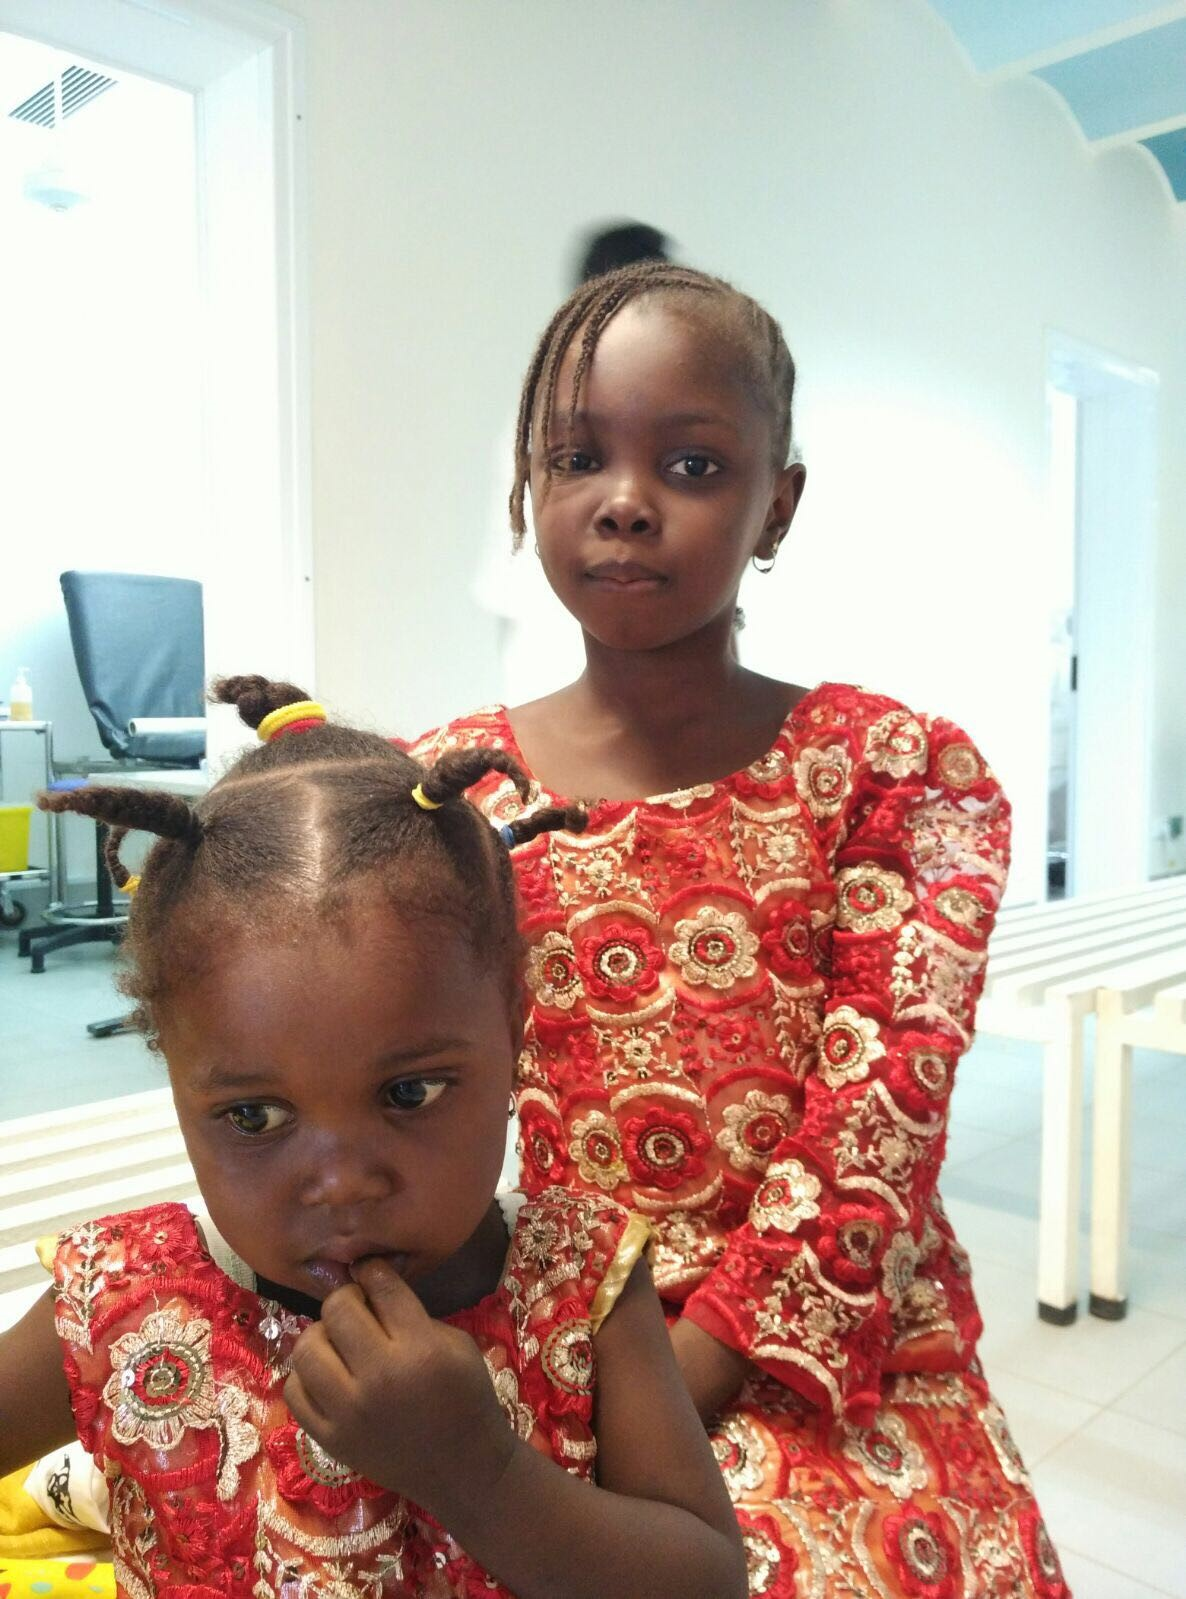 Sudan: Remember Aisha And Hawa?